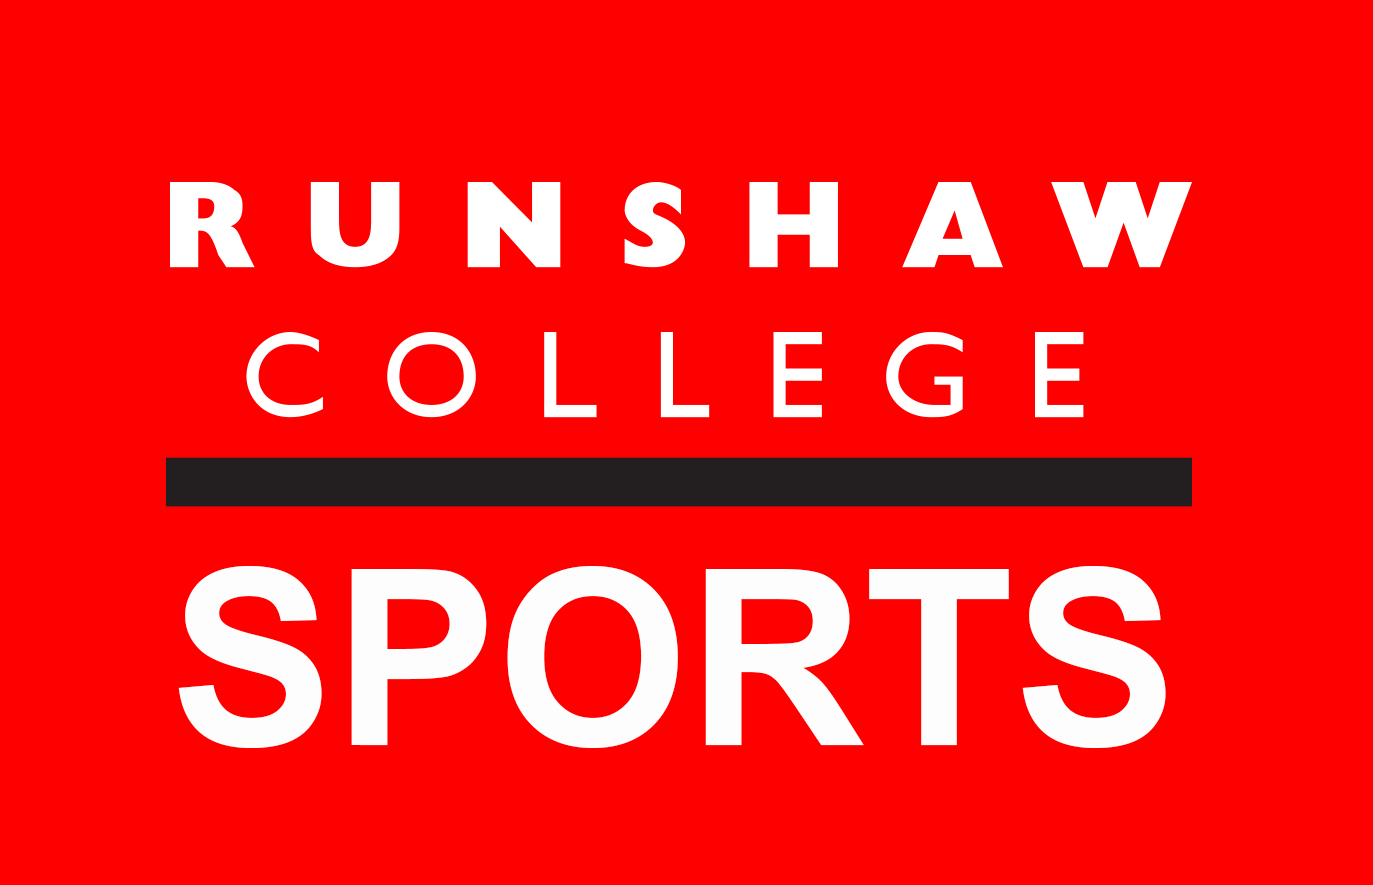 runshaw-college-sports.png